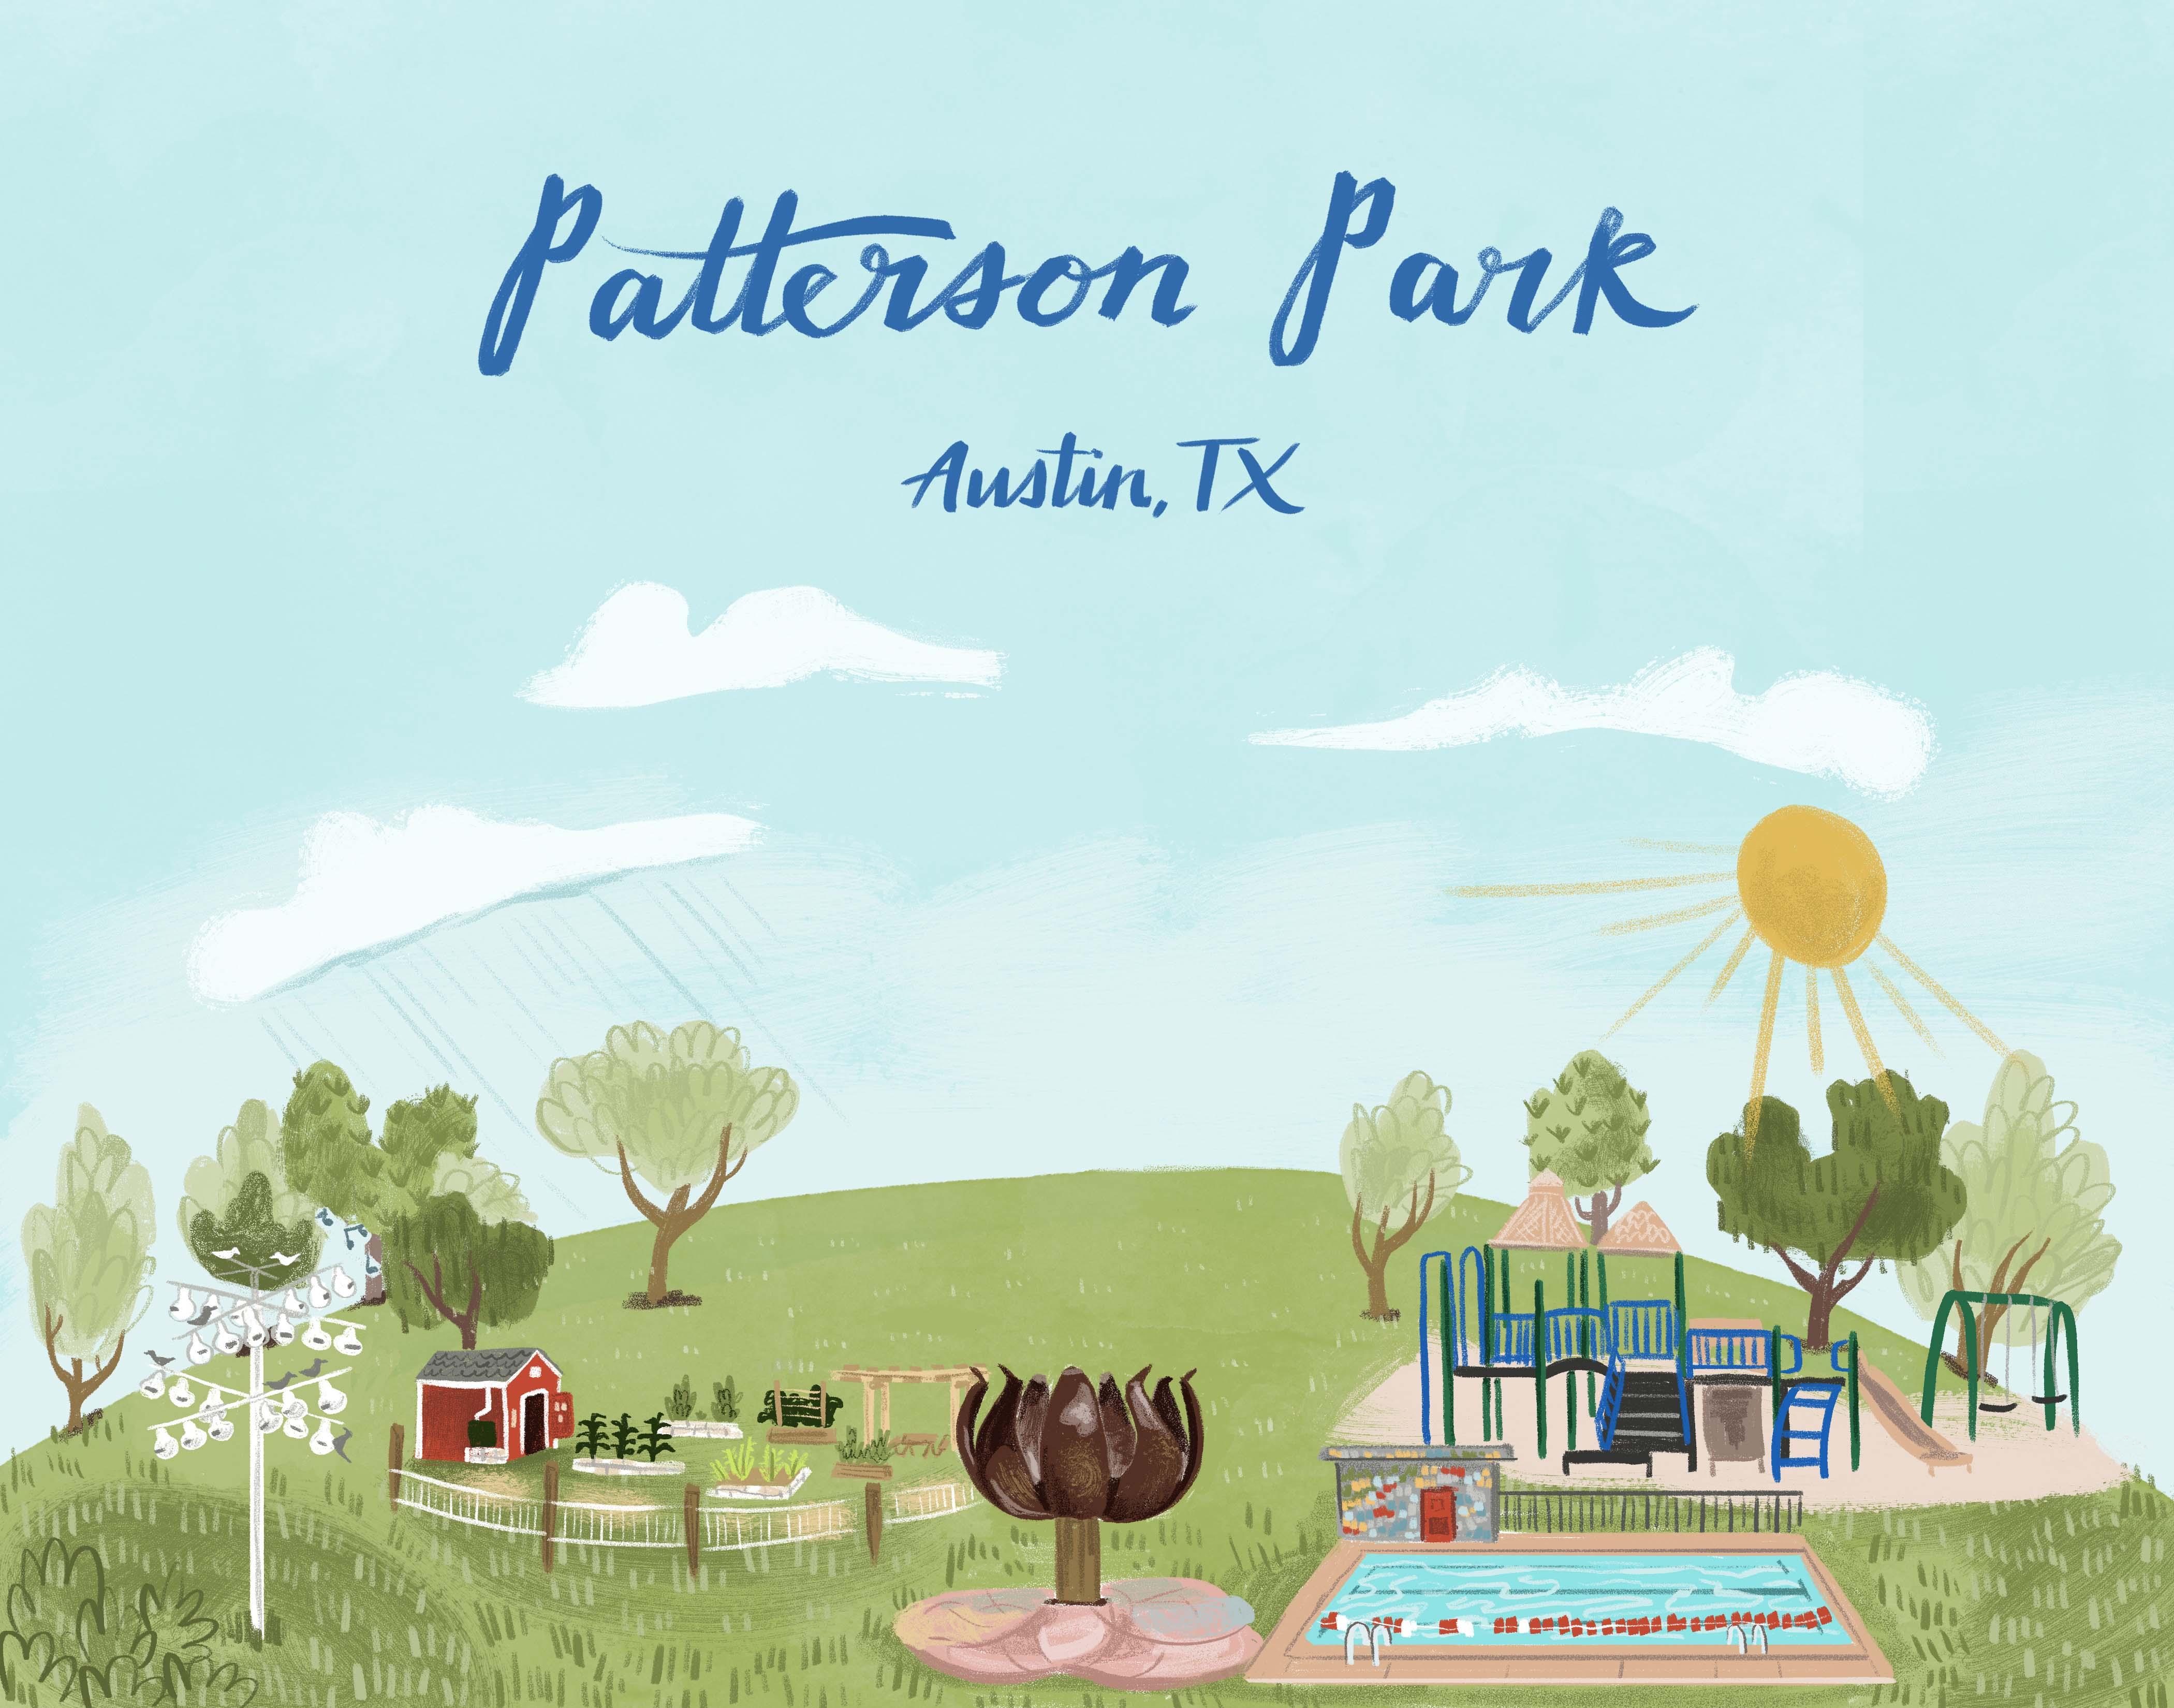 Patterson Park Illustration by Caitlin B. Alexander